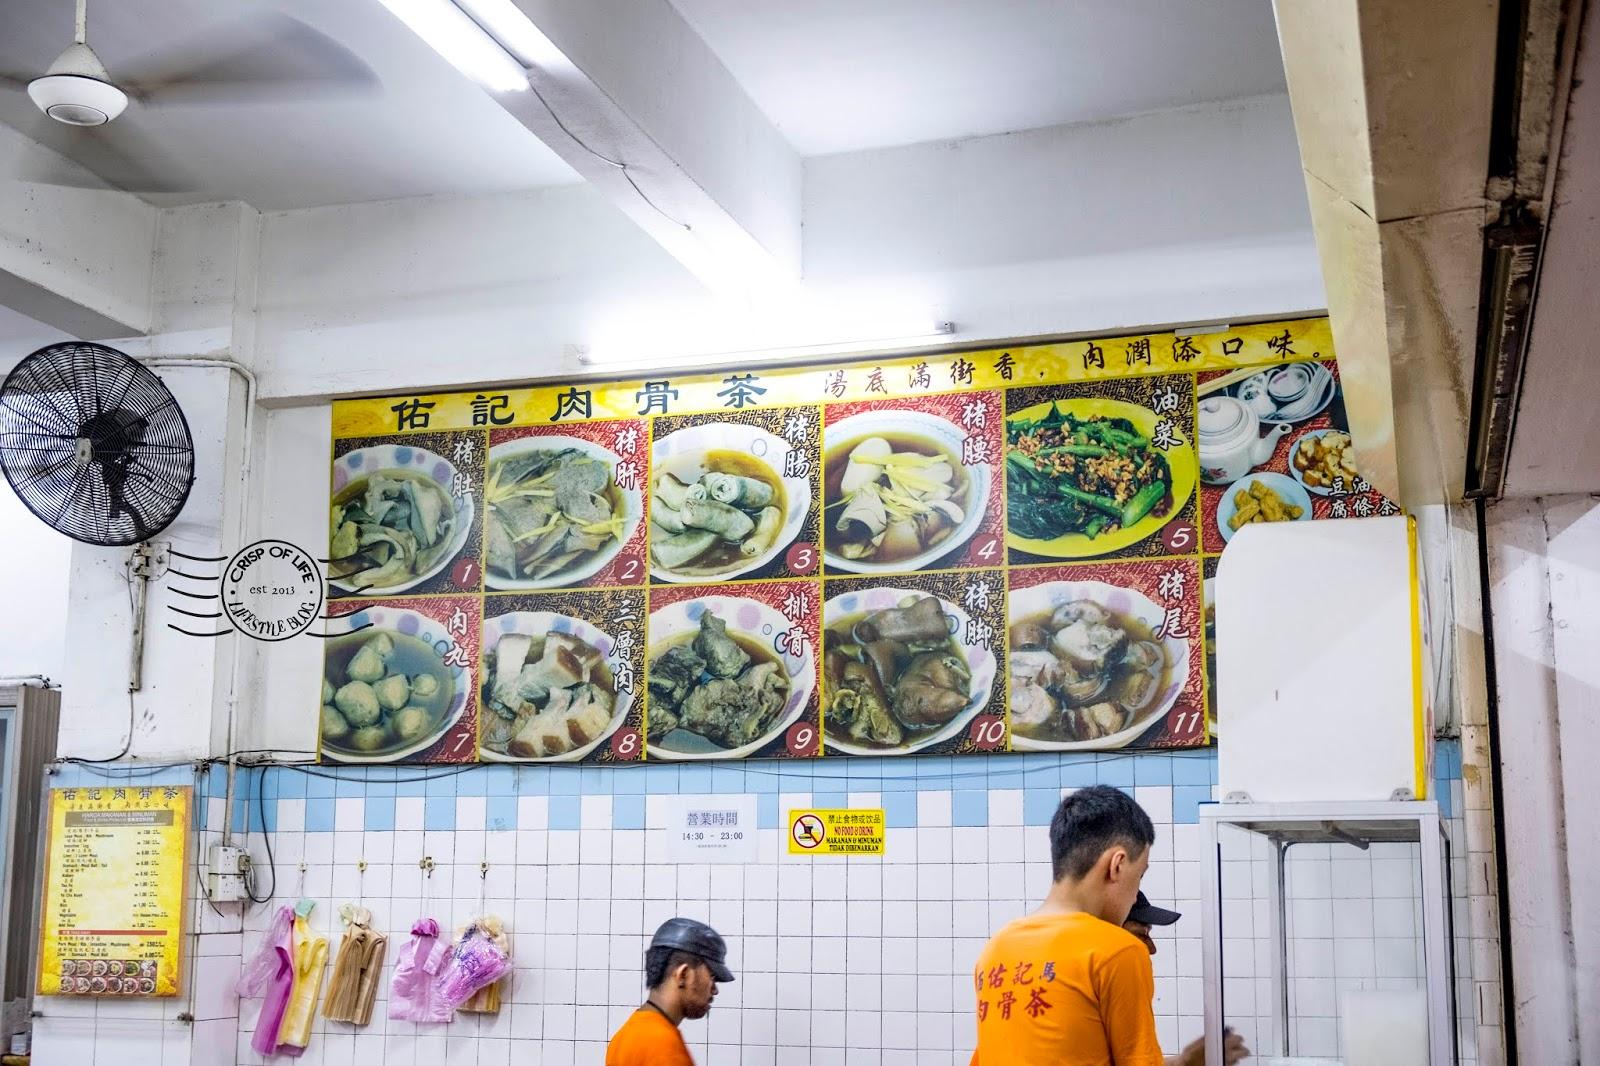 Yu Kee Bak Kut (佑记肉骨茶) @ Jalan Gaya, Kota Kinabalu, Sabah